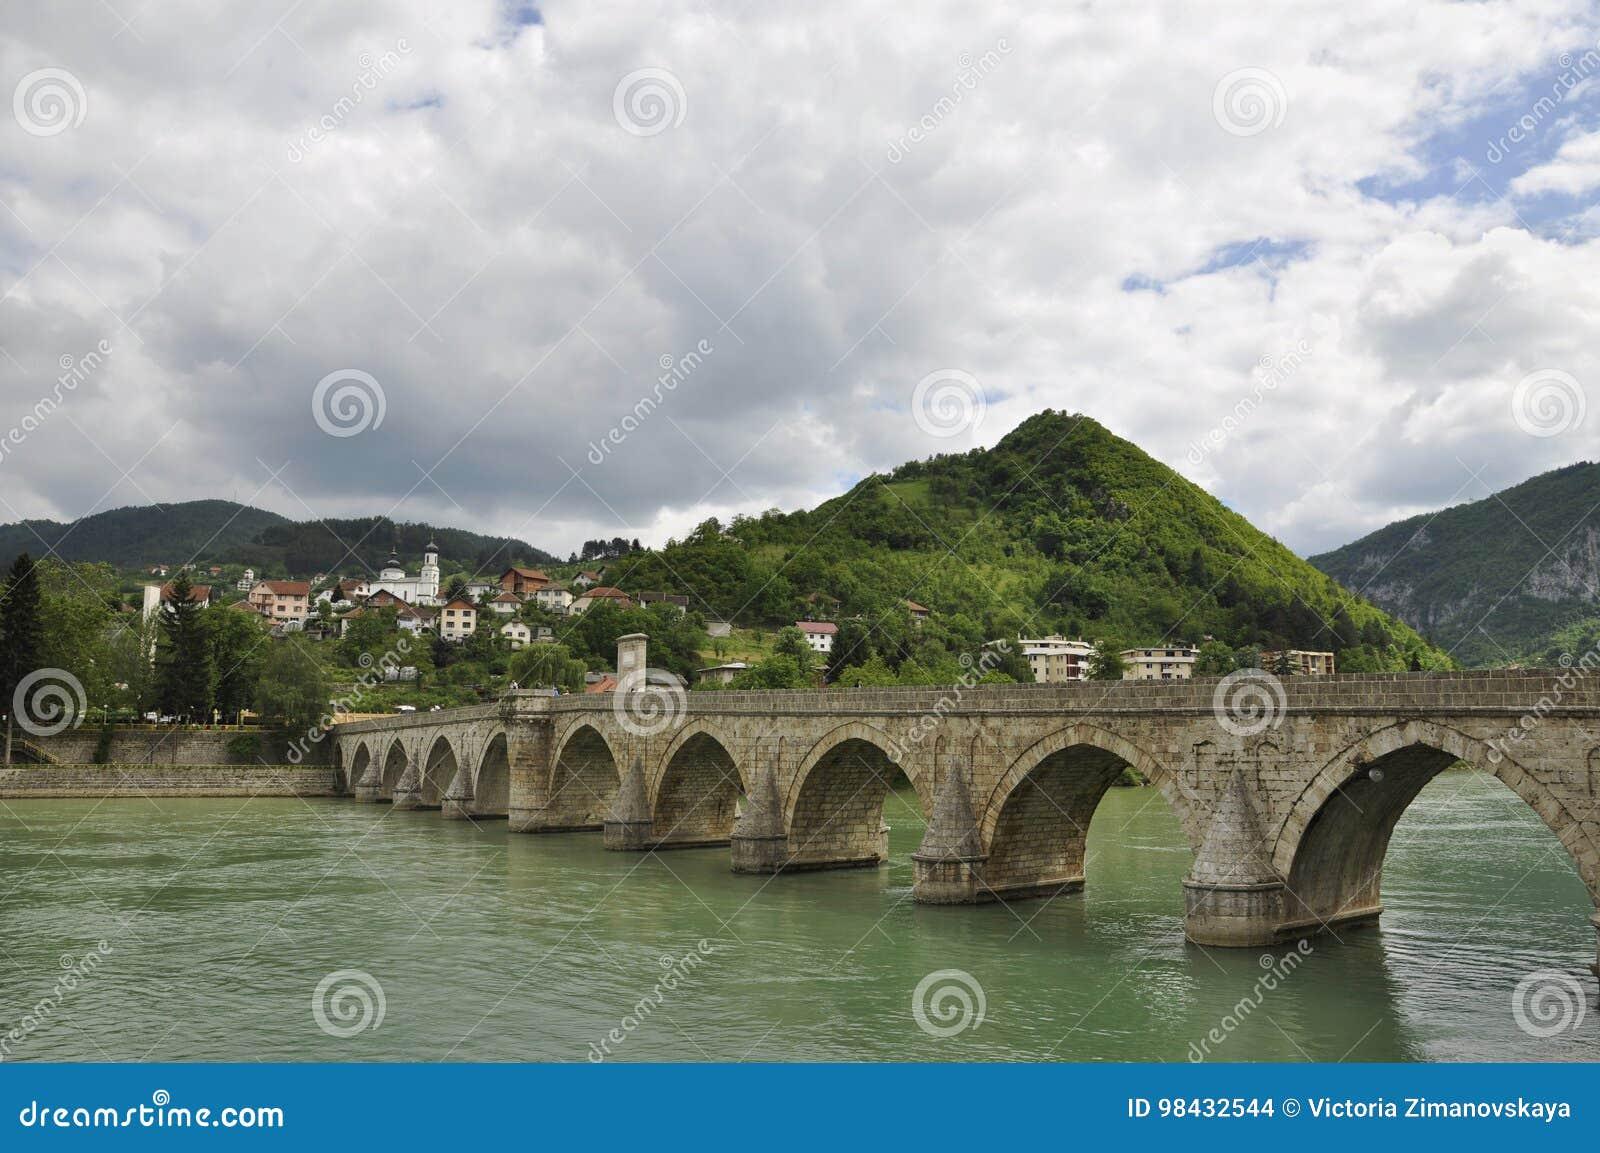 Ponte di Visegrad, o il ponte di Mehmed Pasha, Visegrad, Bosnia-Erzegovina